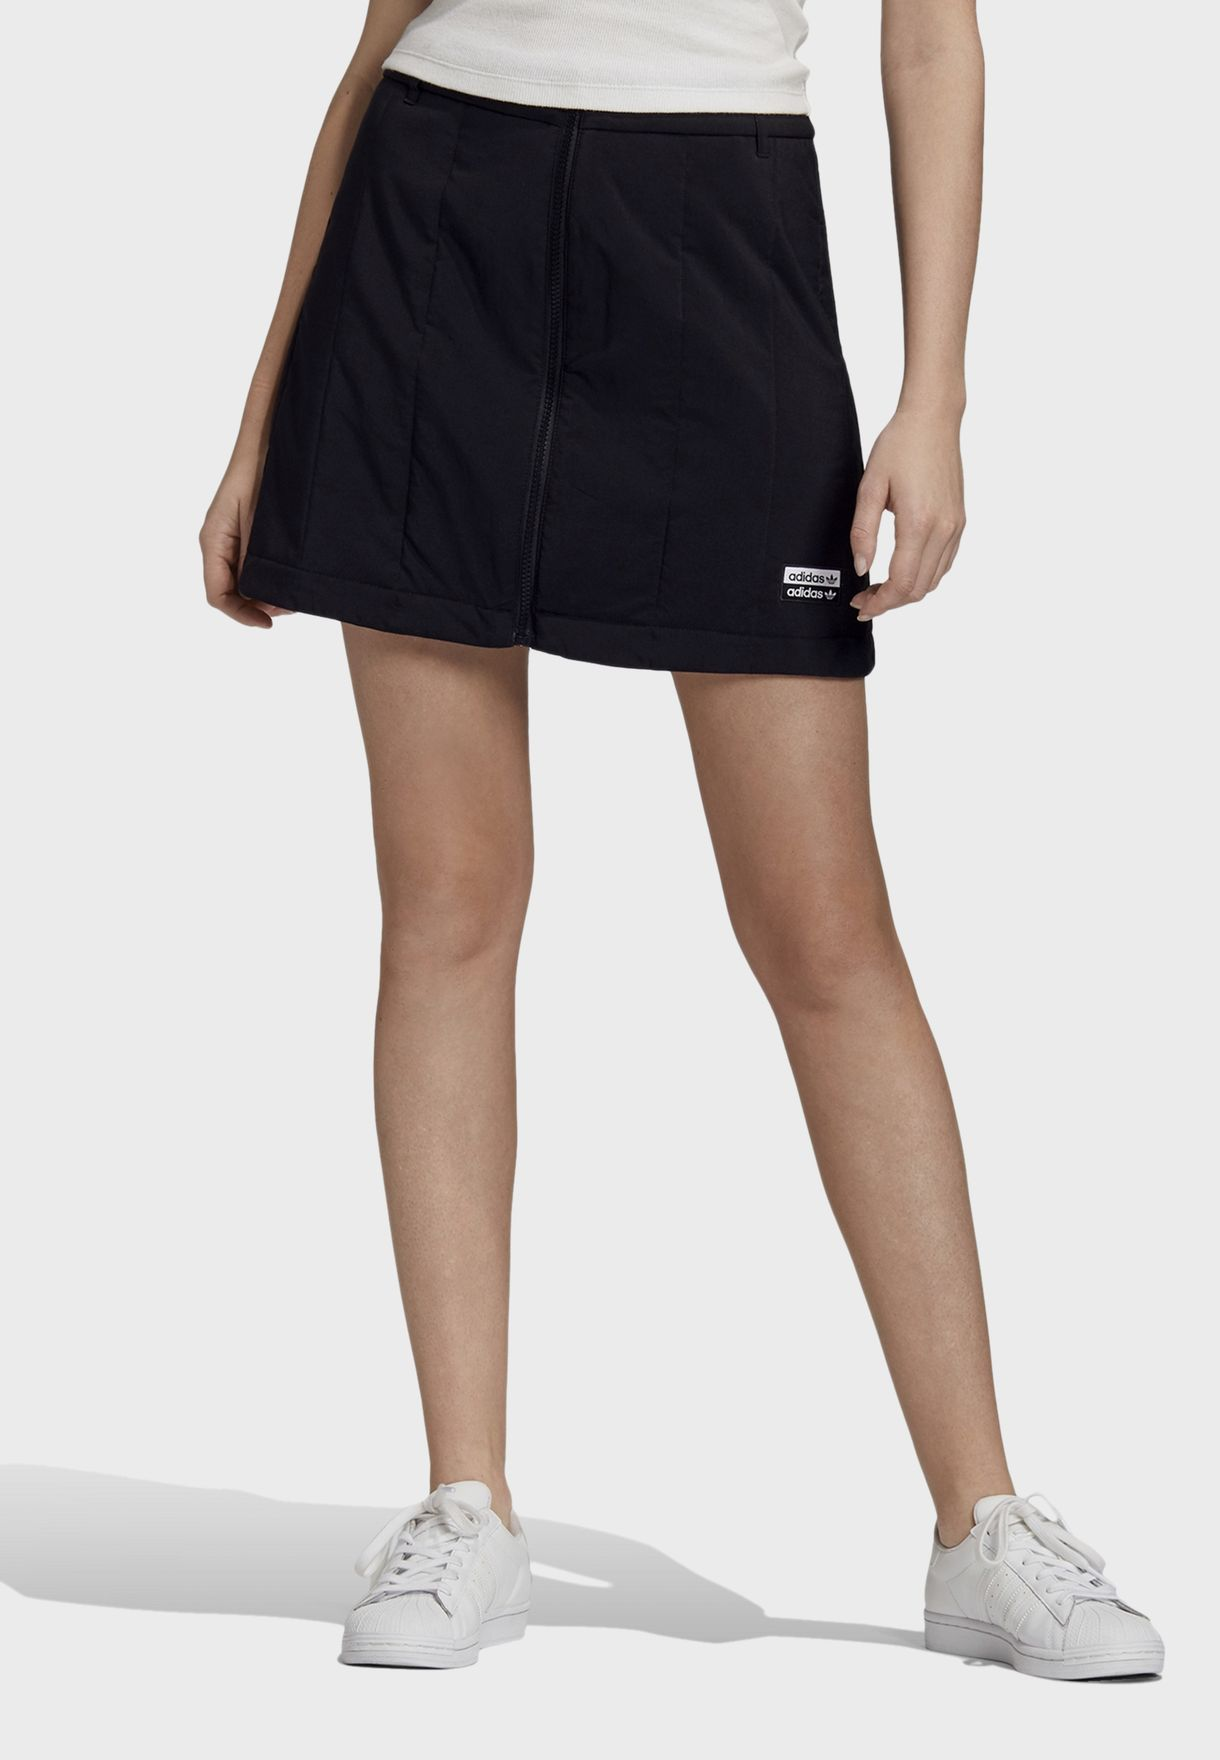 R.Y.V Skirt